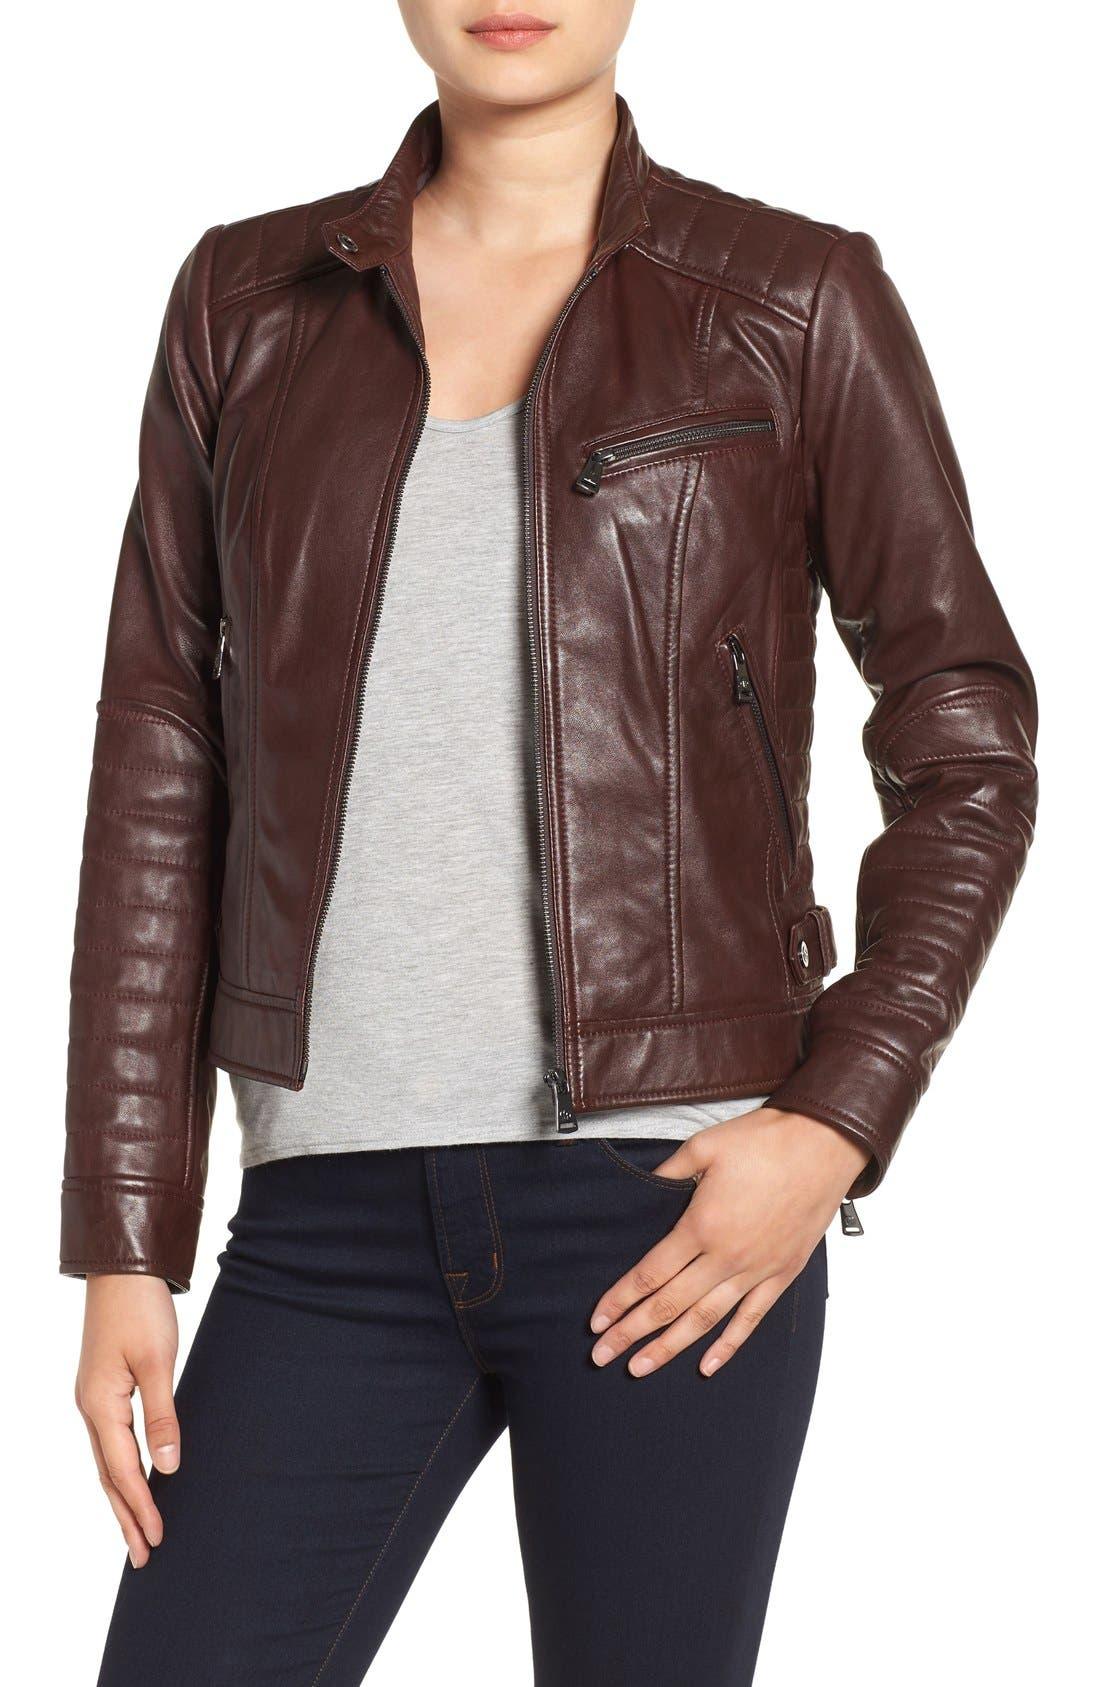 Alternate Image 1 Selected - Bernardo Quilted Leather Moto Jacket (Regular & Petite)